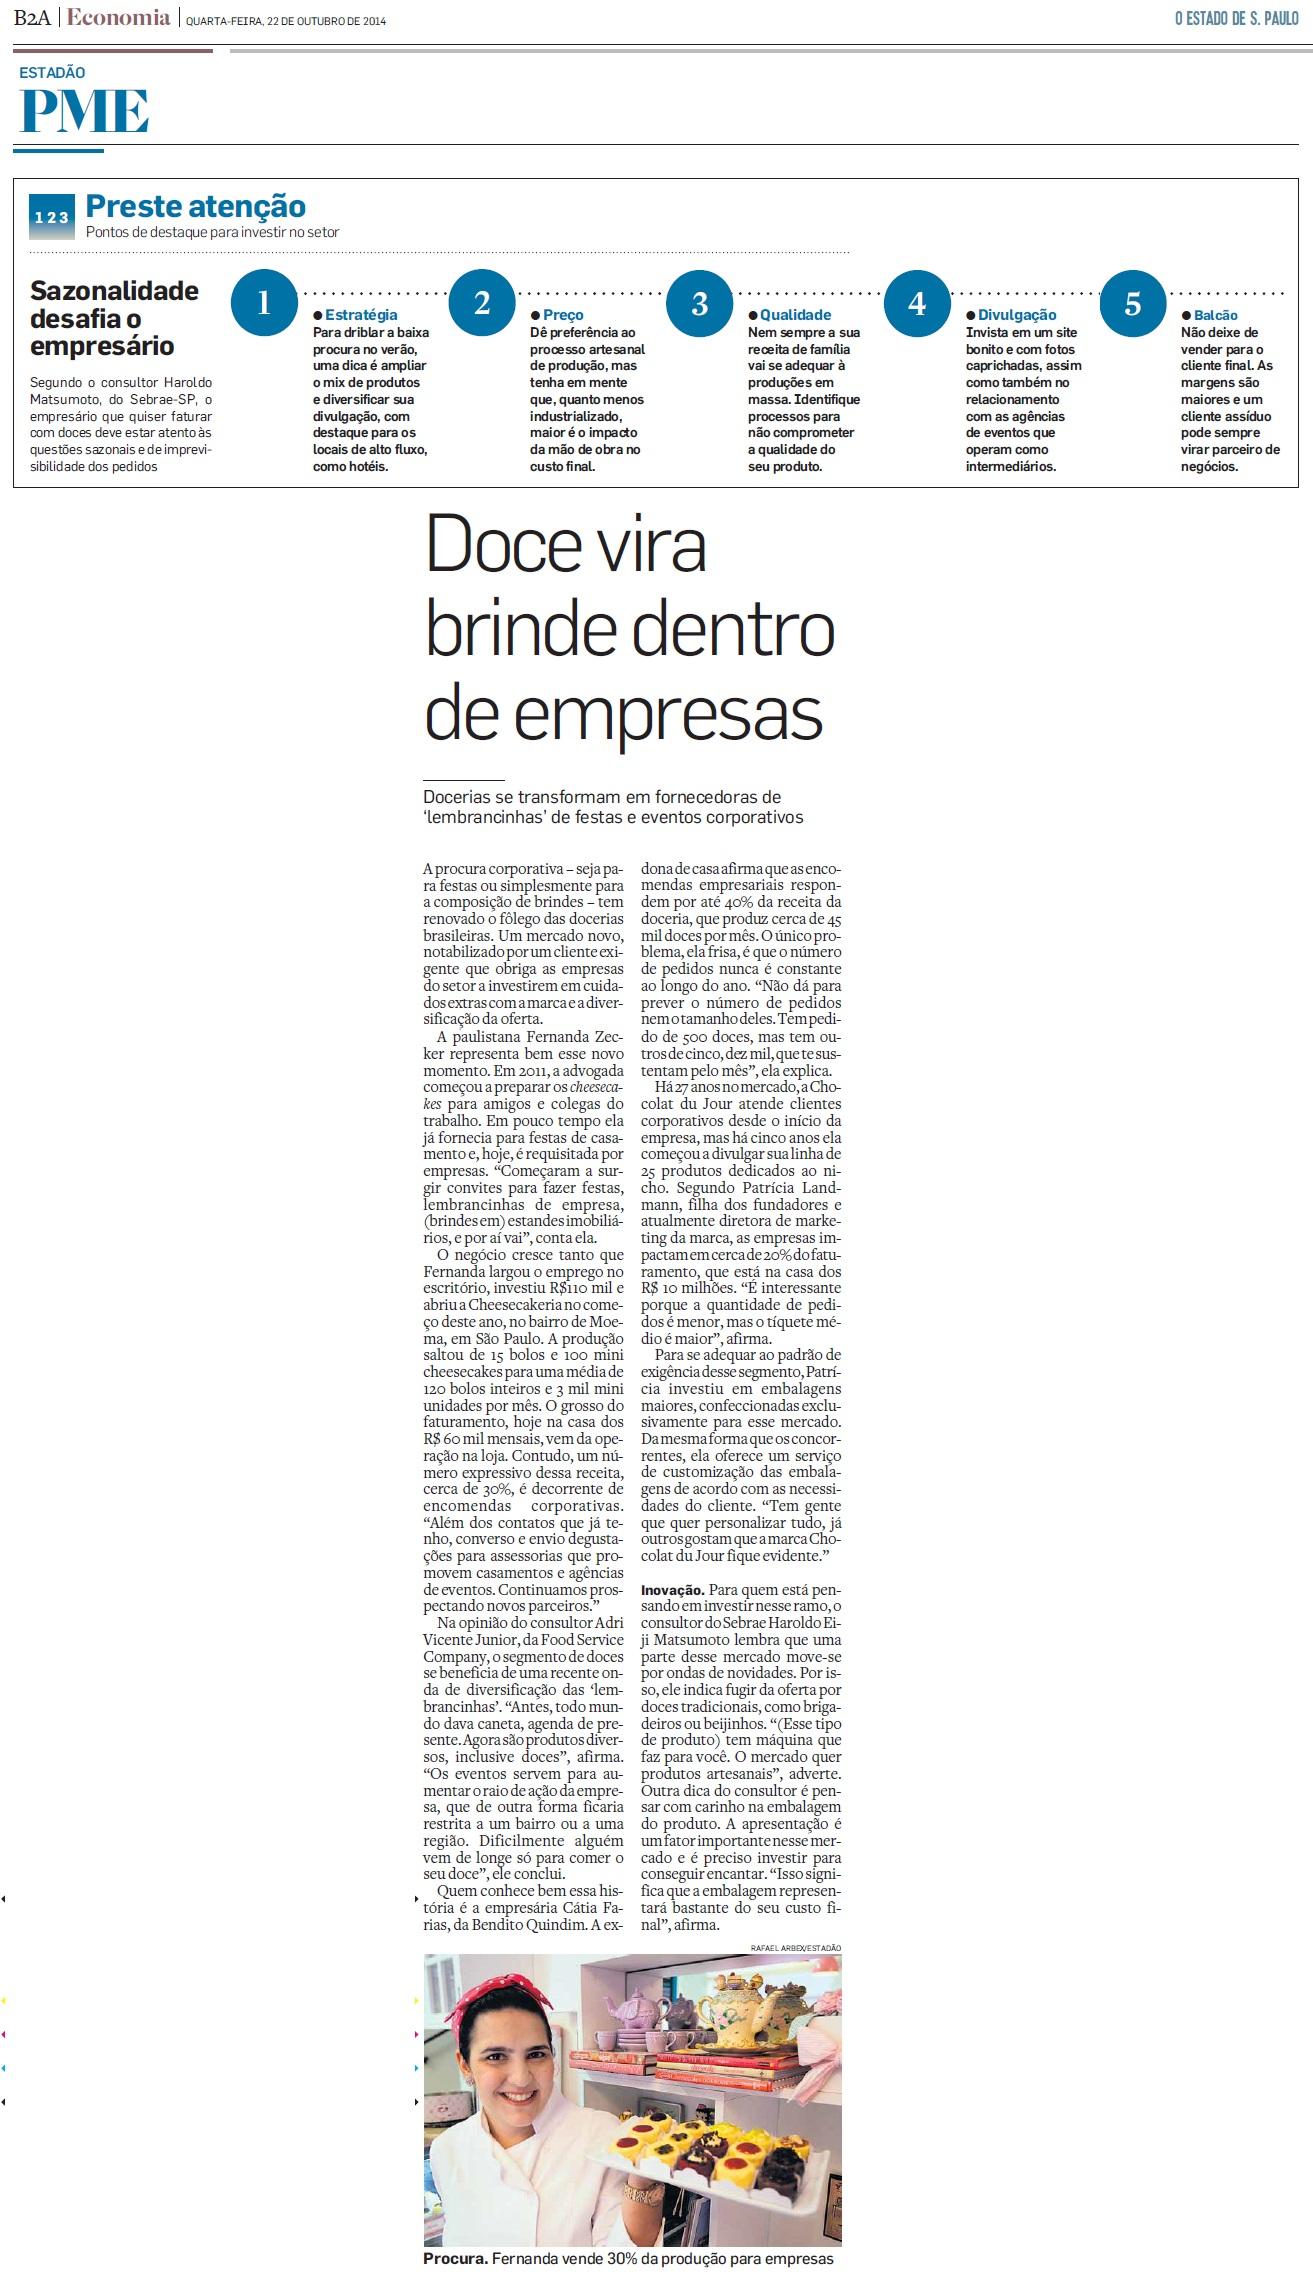 O Estado de S. Paulo - PME - 22.10.2014